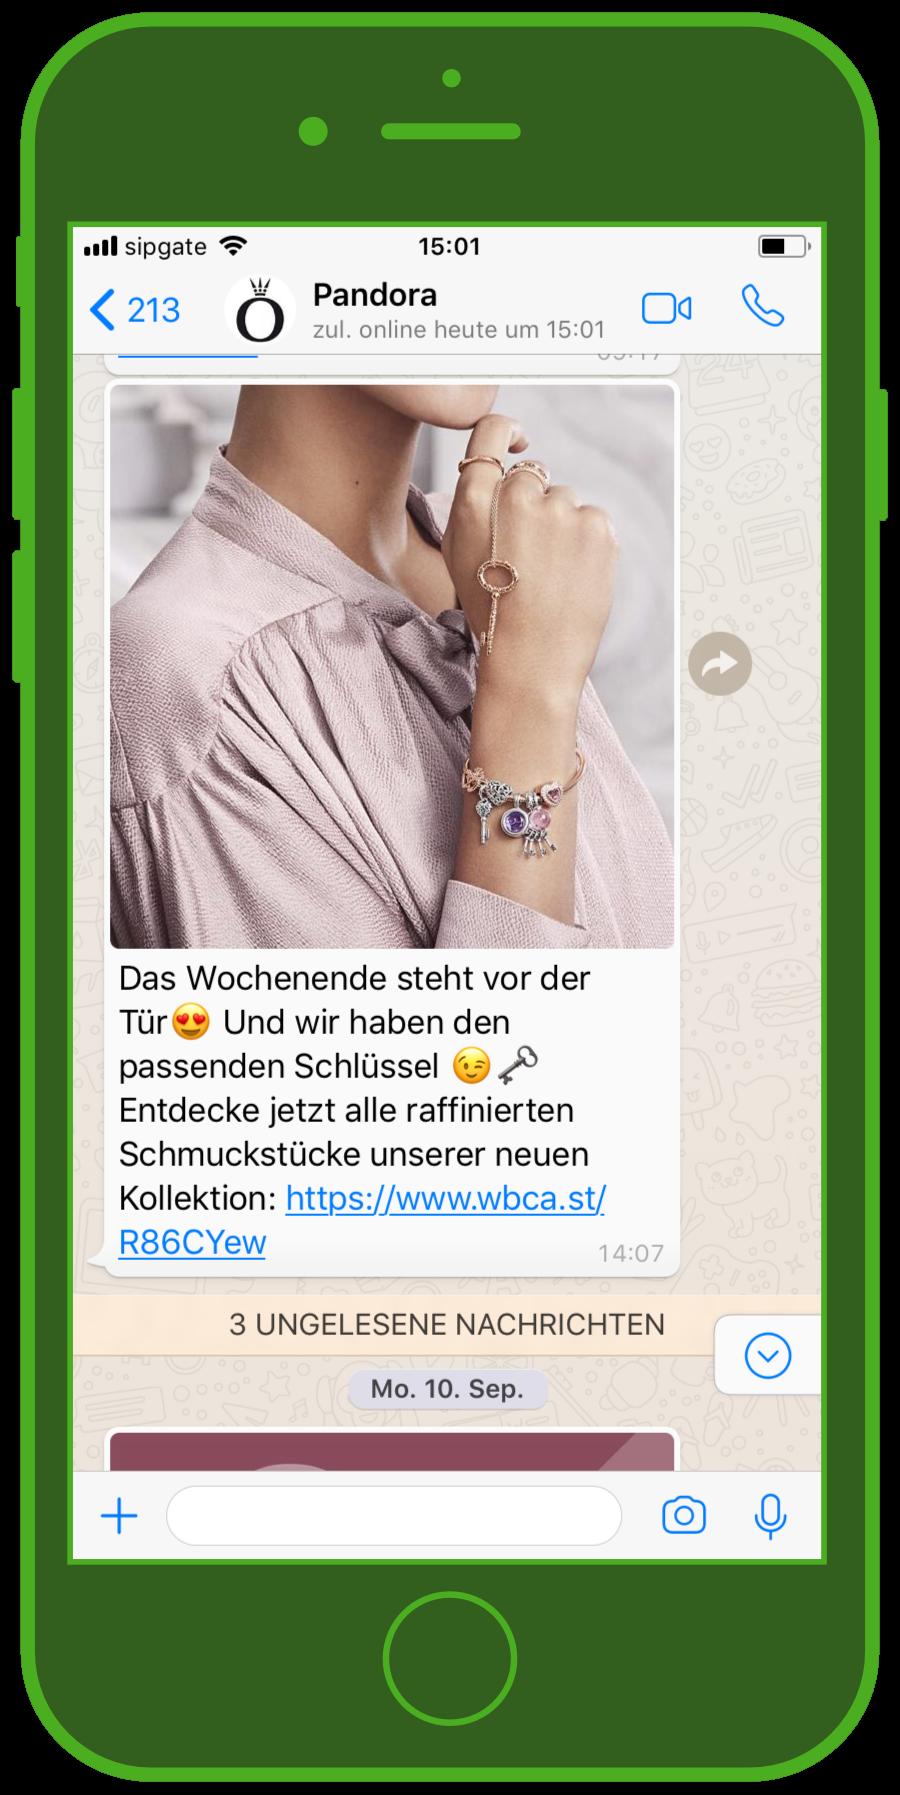 device-pandora-whatsapp-screenshot